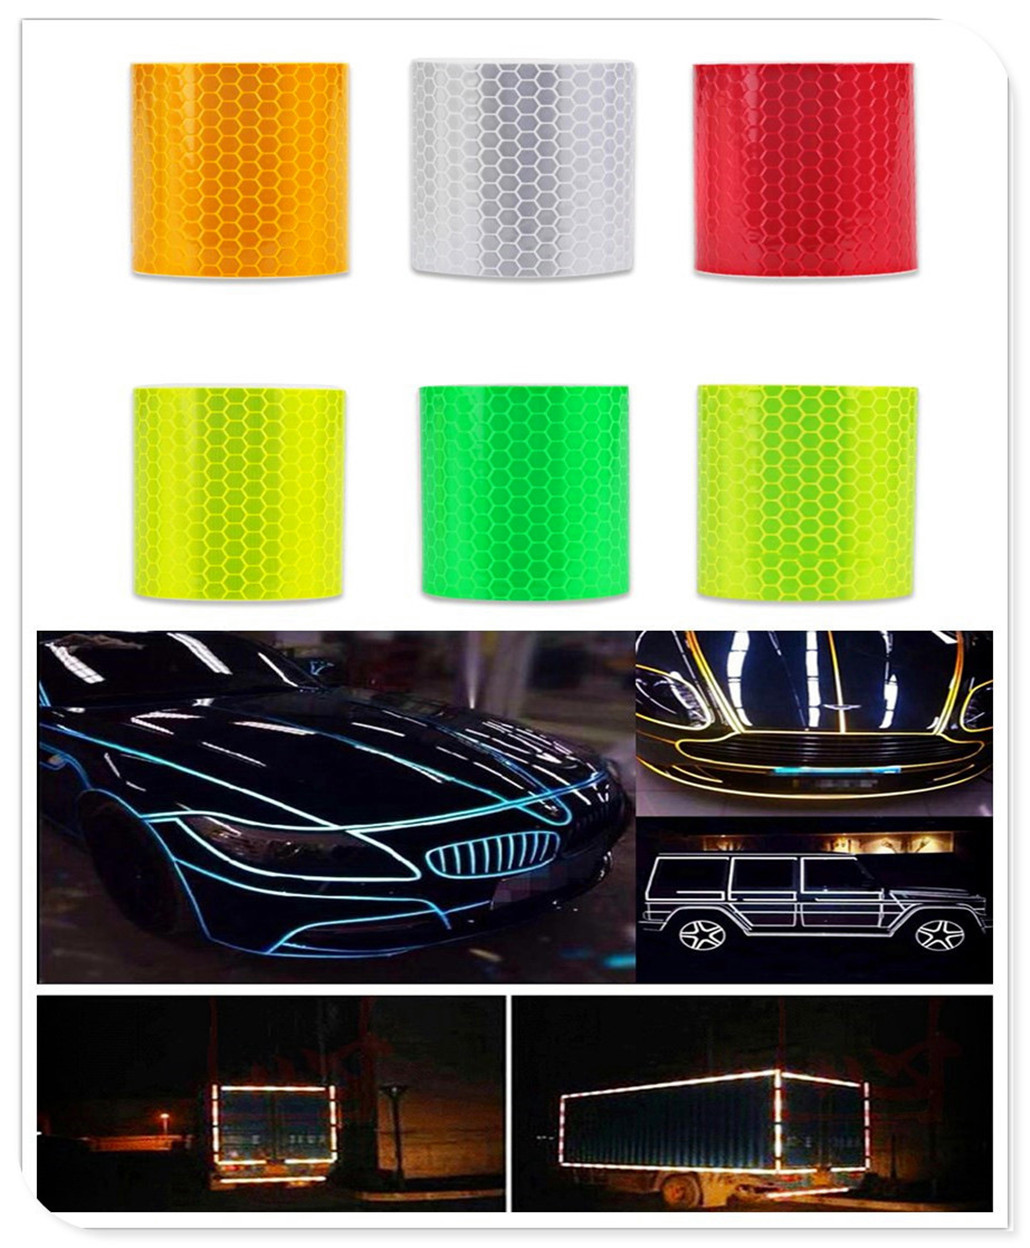 Car Accessories Reflective Sticker Decal Warning Tape Film for Chevrolet Cobalt Celta West Uplander Cavalier Astra